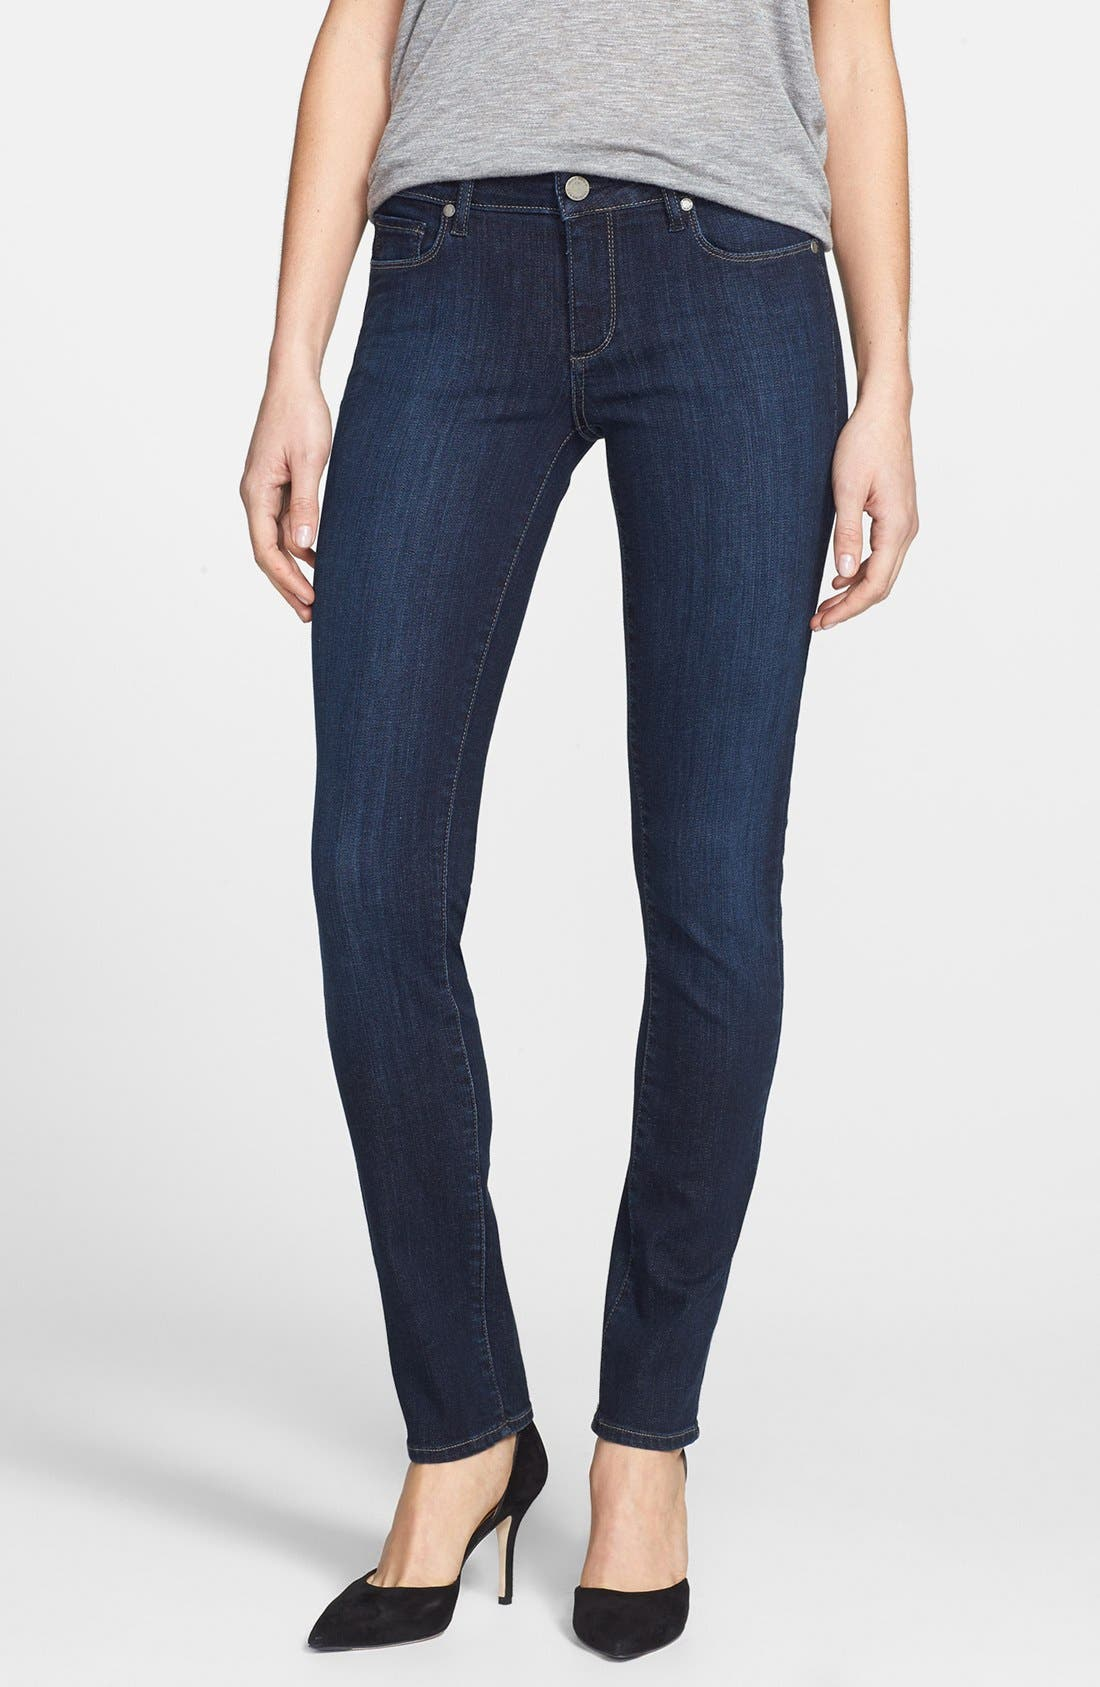 Alternate Image 1 Selected - Paige Denim 'Skyline' Skinny Jeans (Trinity)